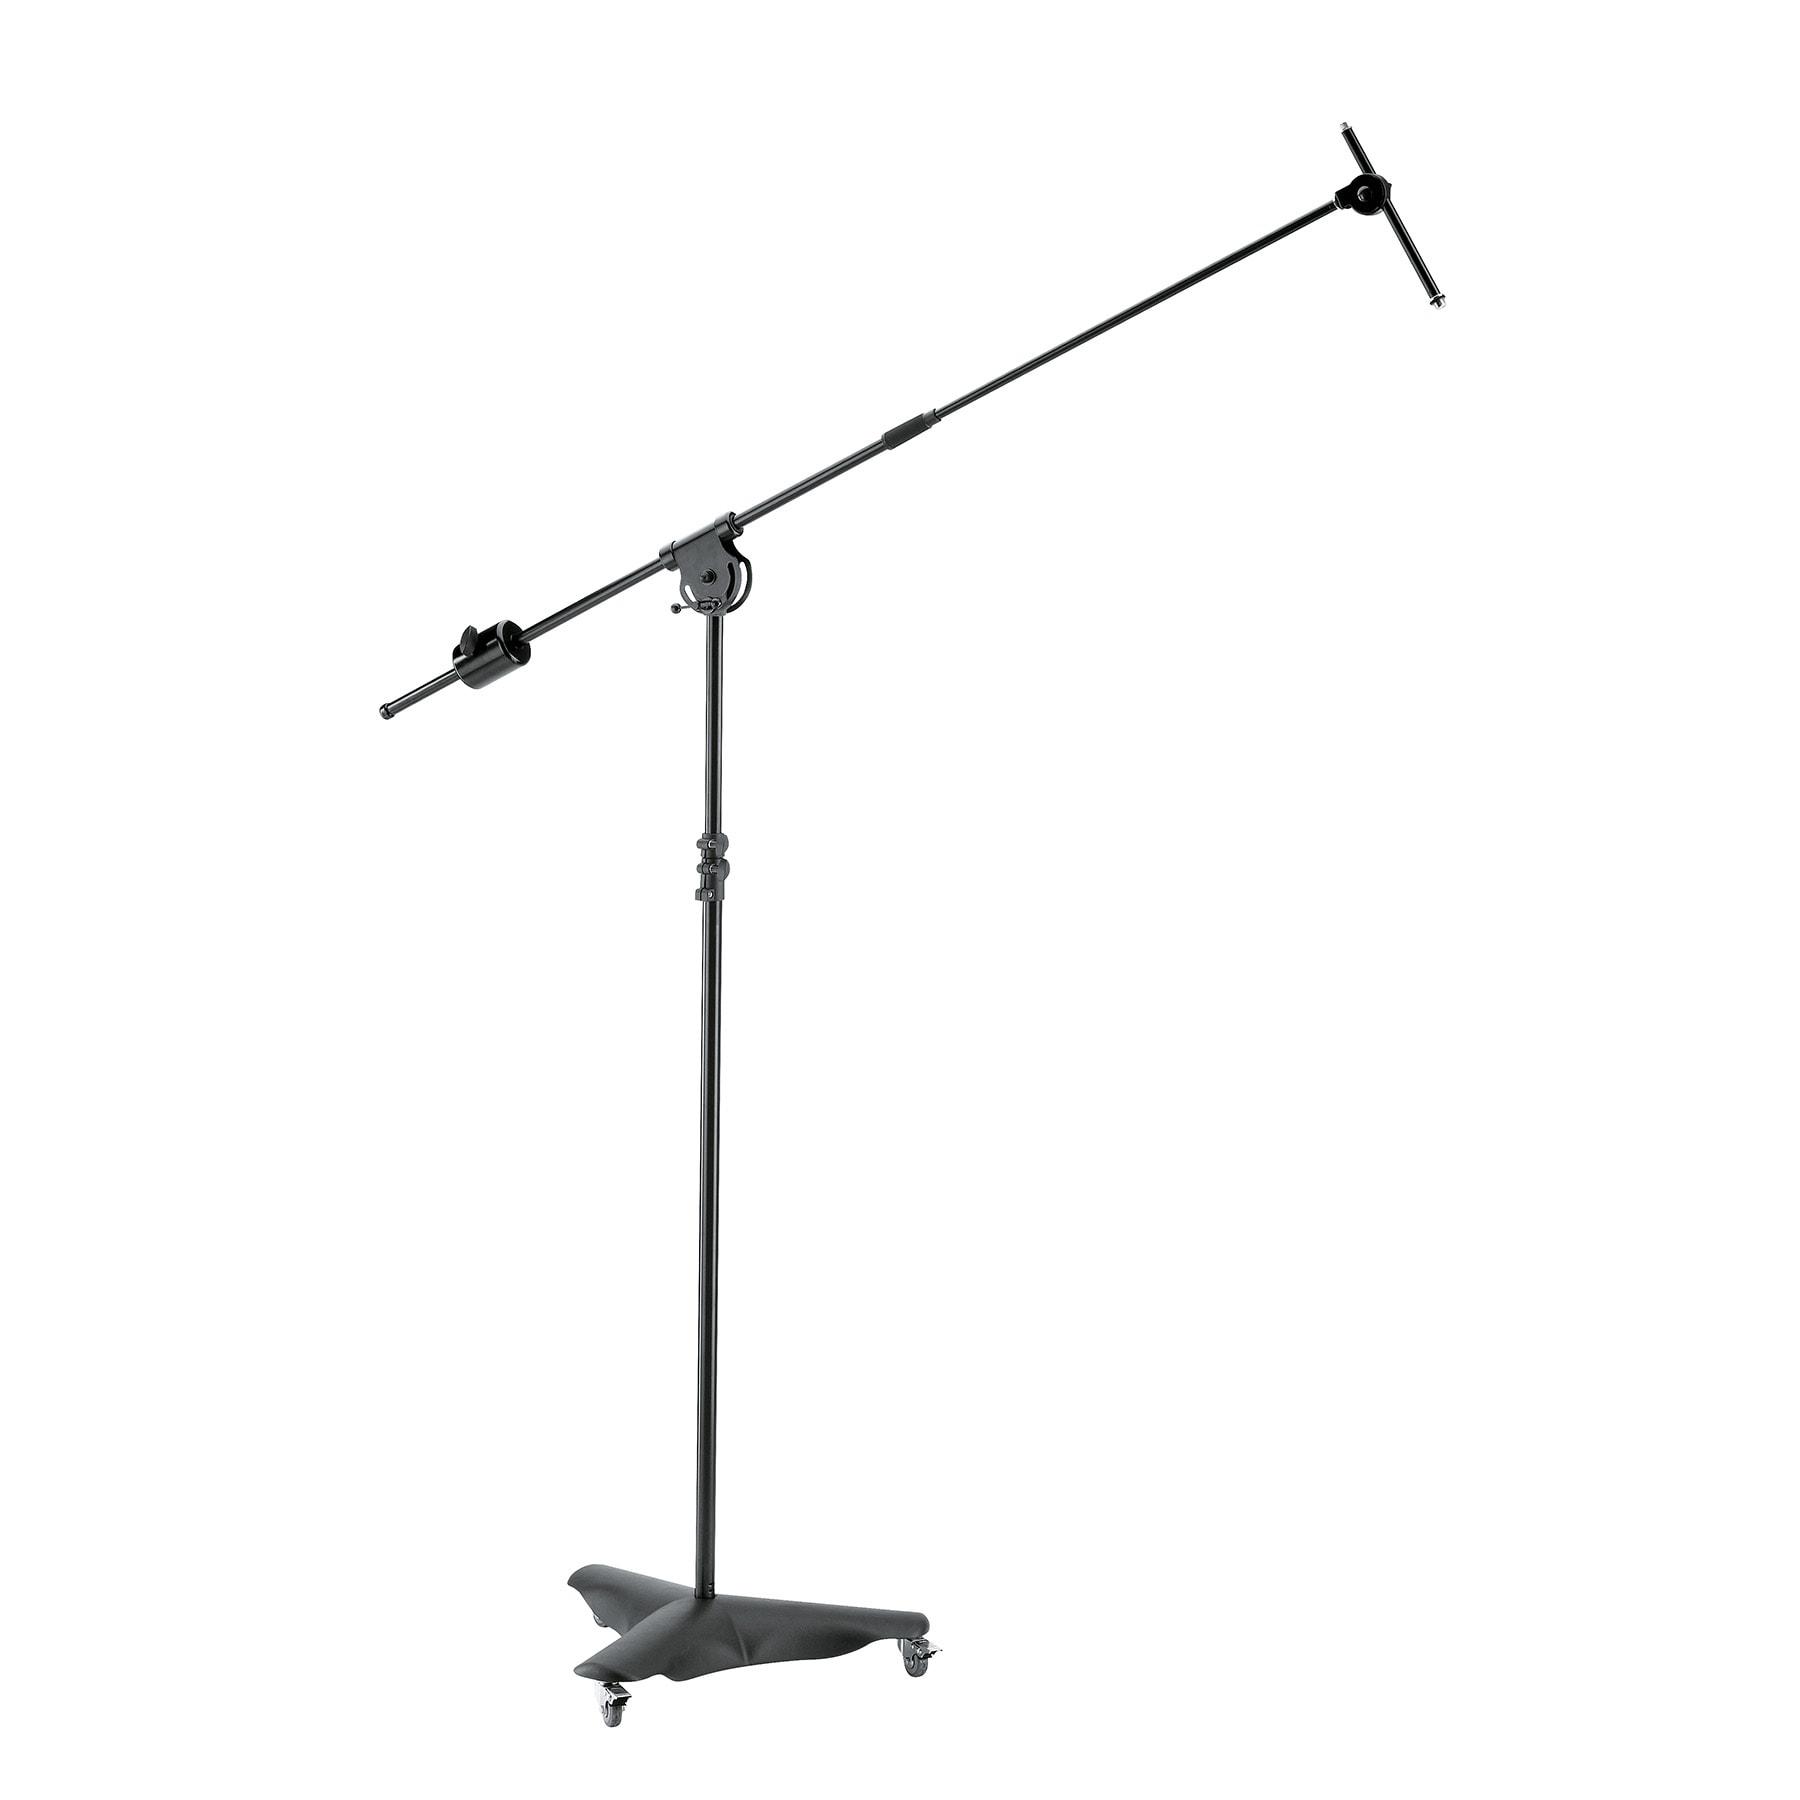 KM21430 - Overhead microphone stand